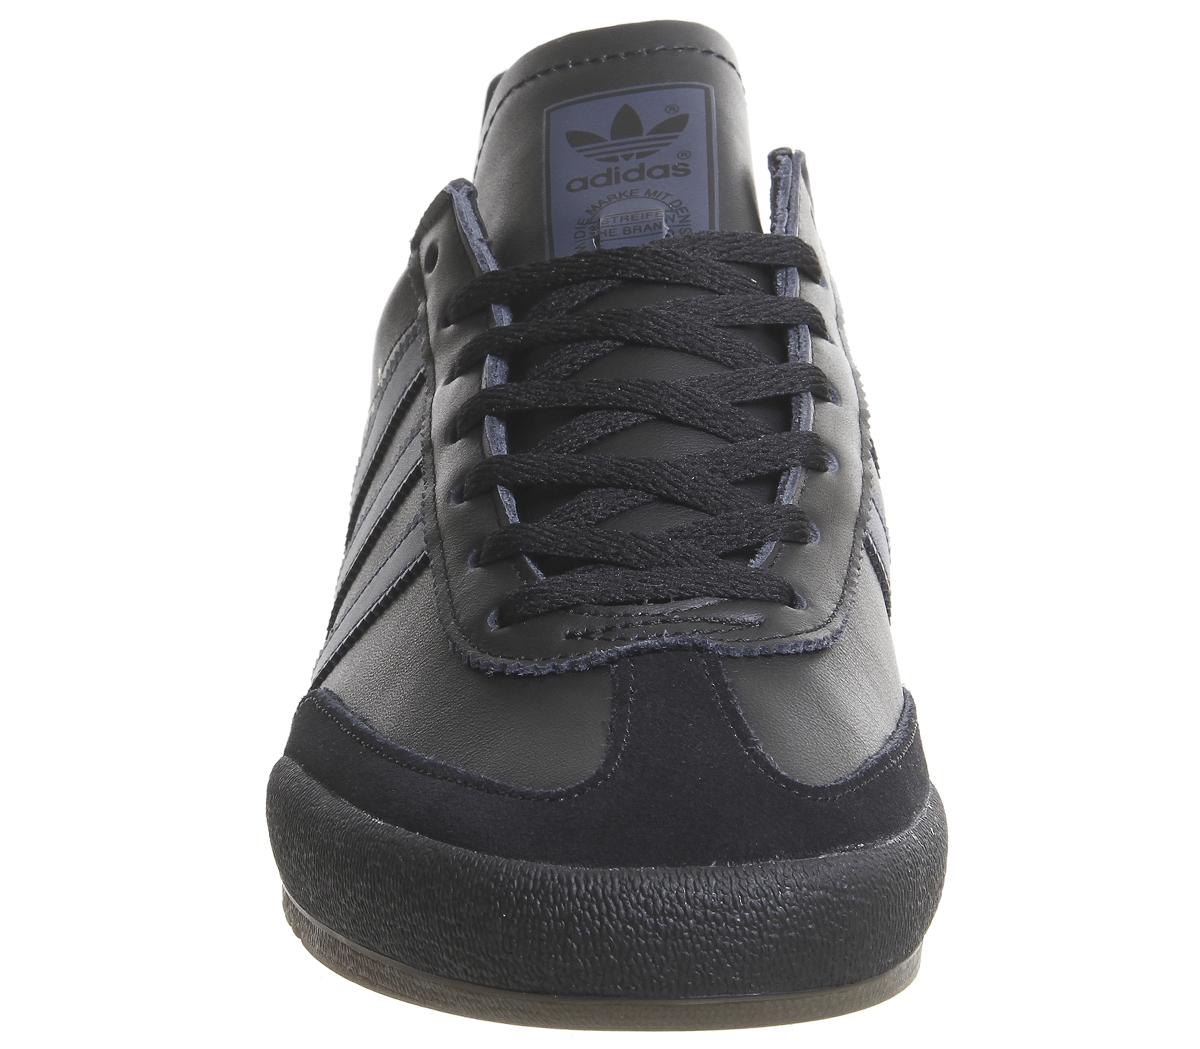 Adidas BLACK Jeans Trainers CORE BLACK Adidas TRACE Blau Trainers Schuhes 8f3e84